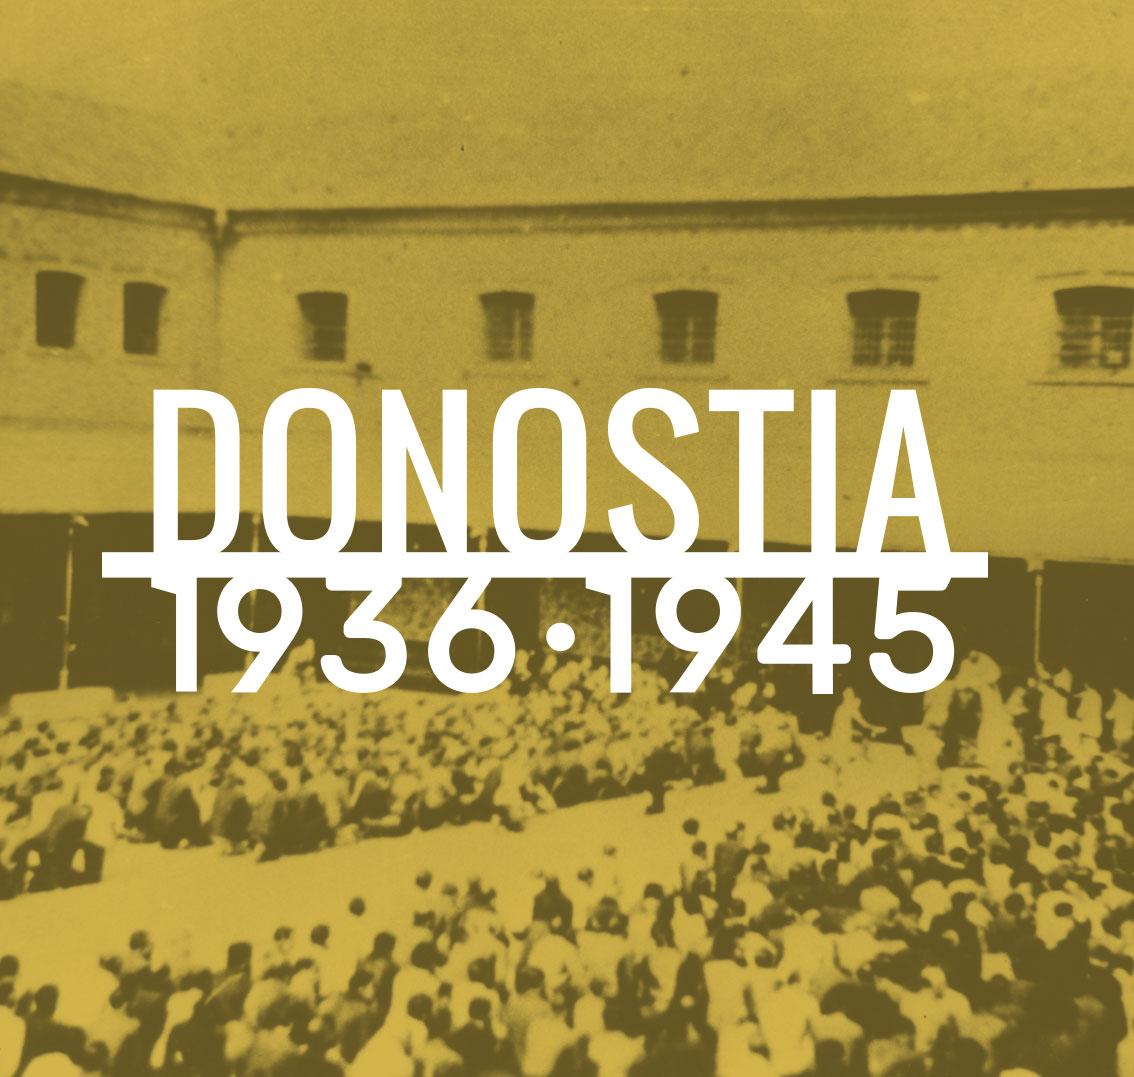 donostia1936